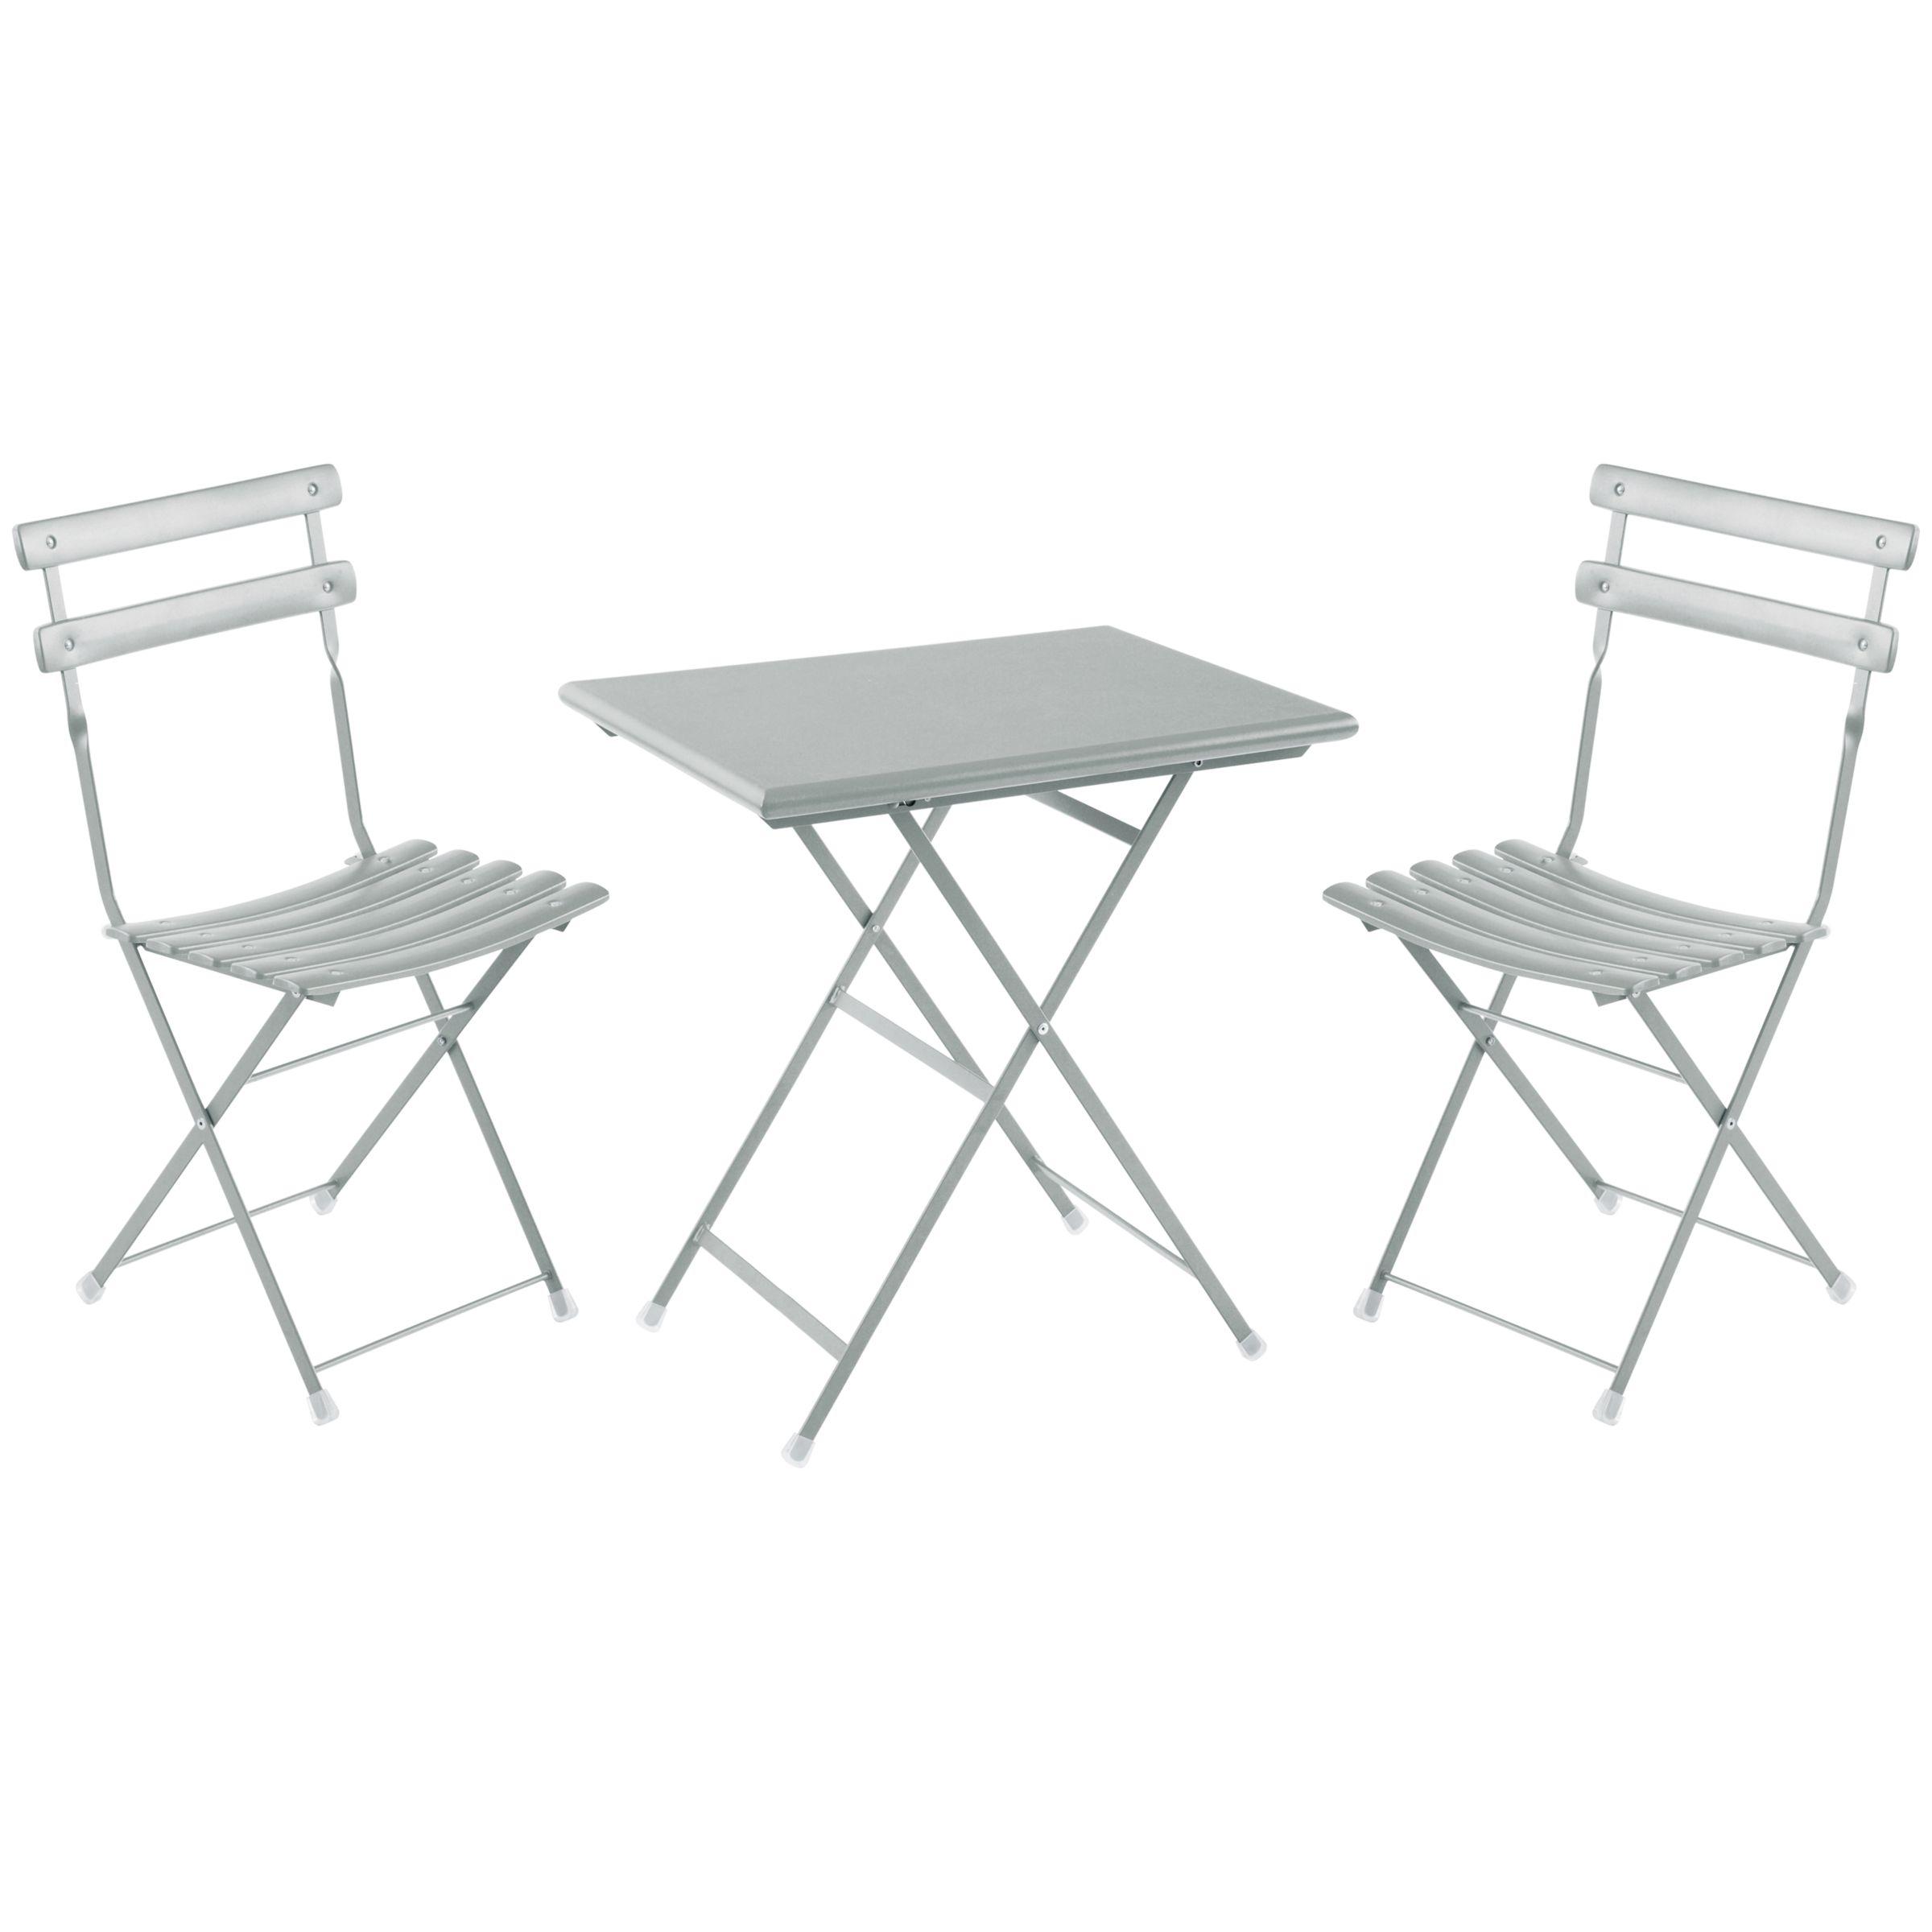 EMU EMU Arc En Ciel Steel Garden Bistro Table and Chairs Set